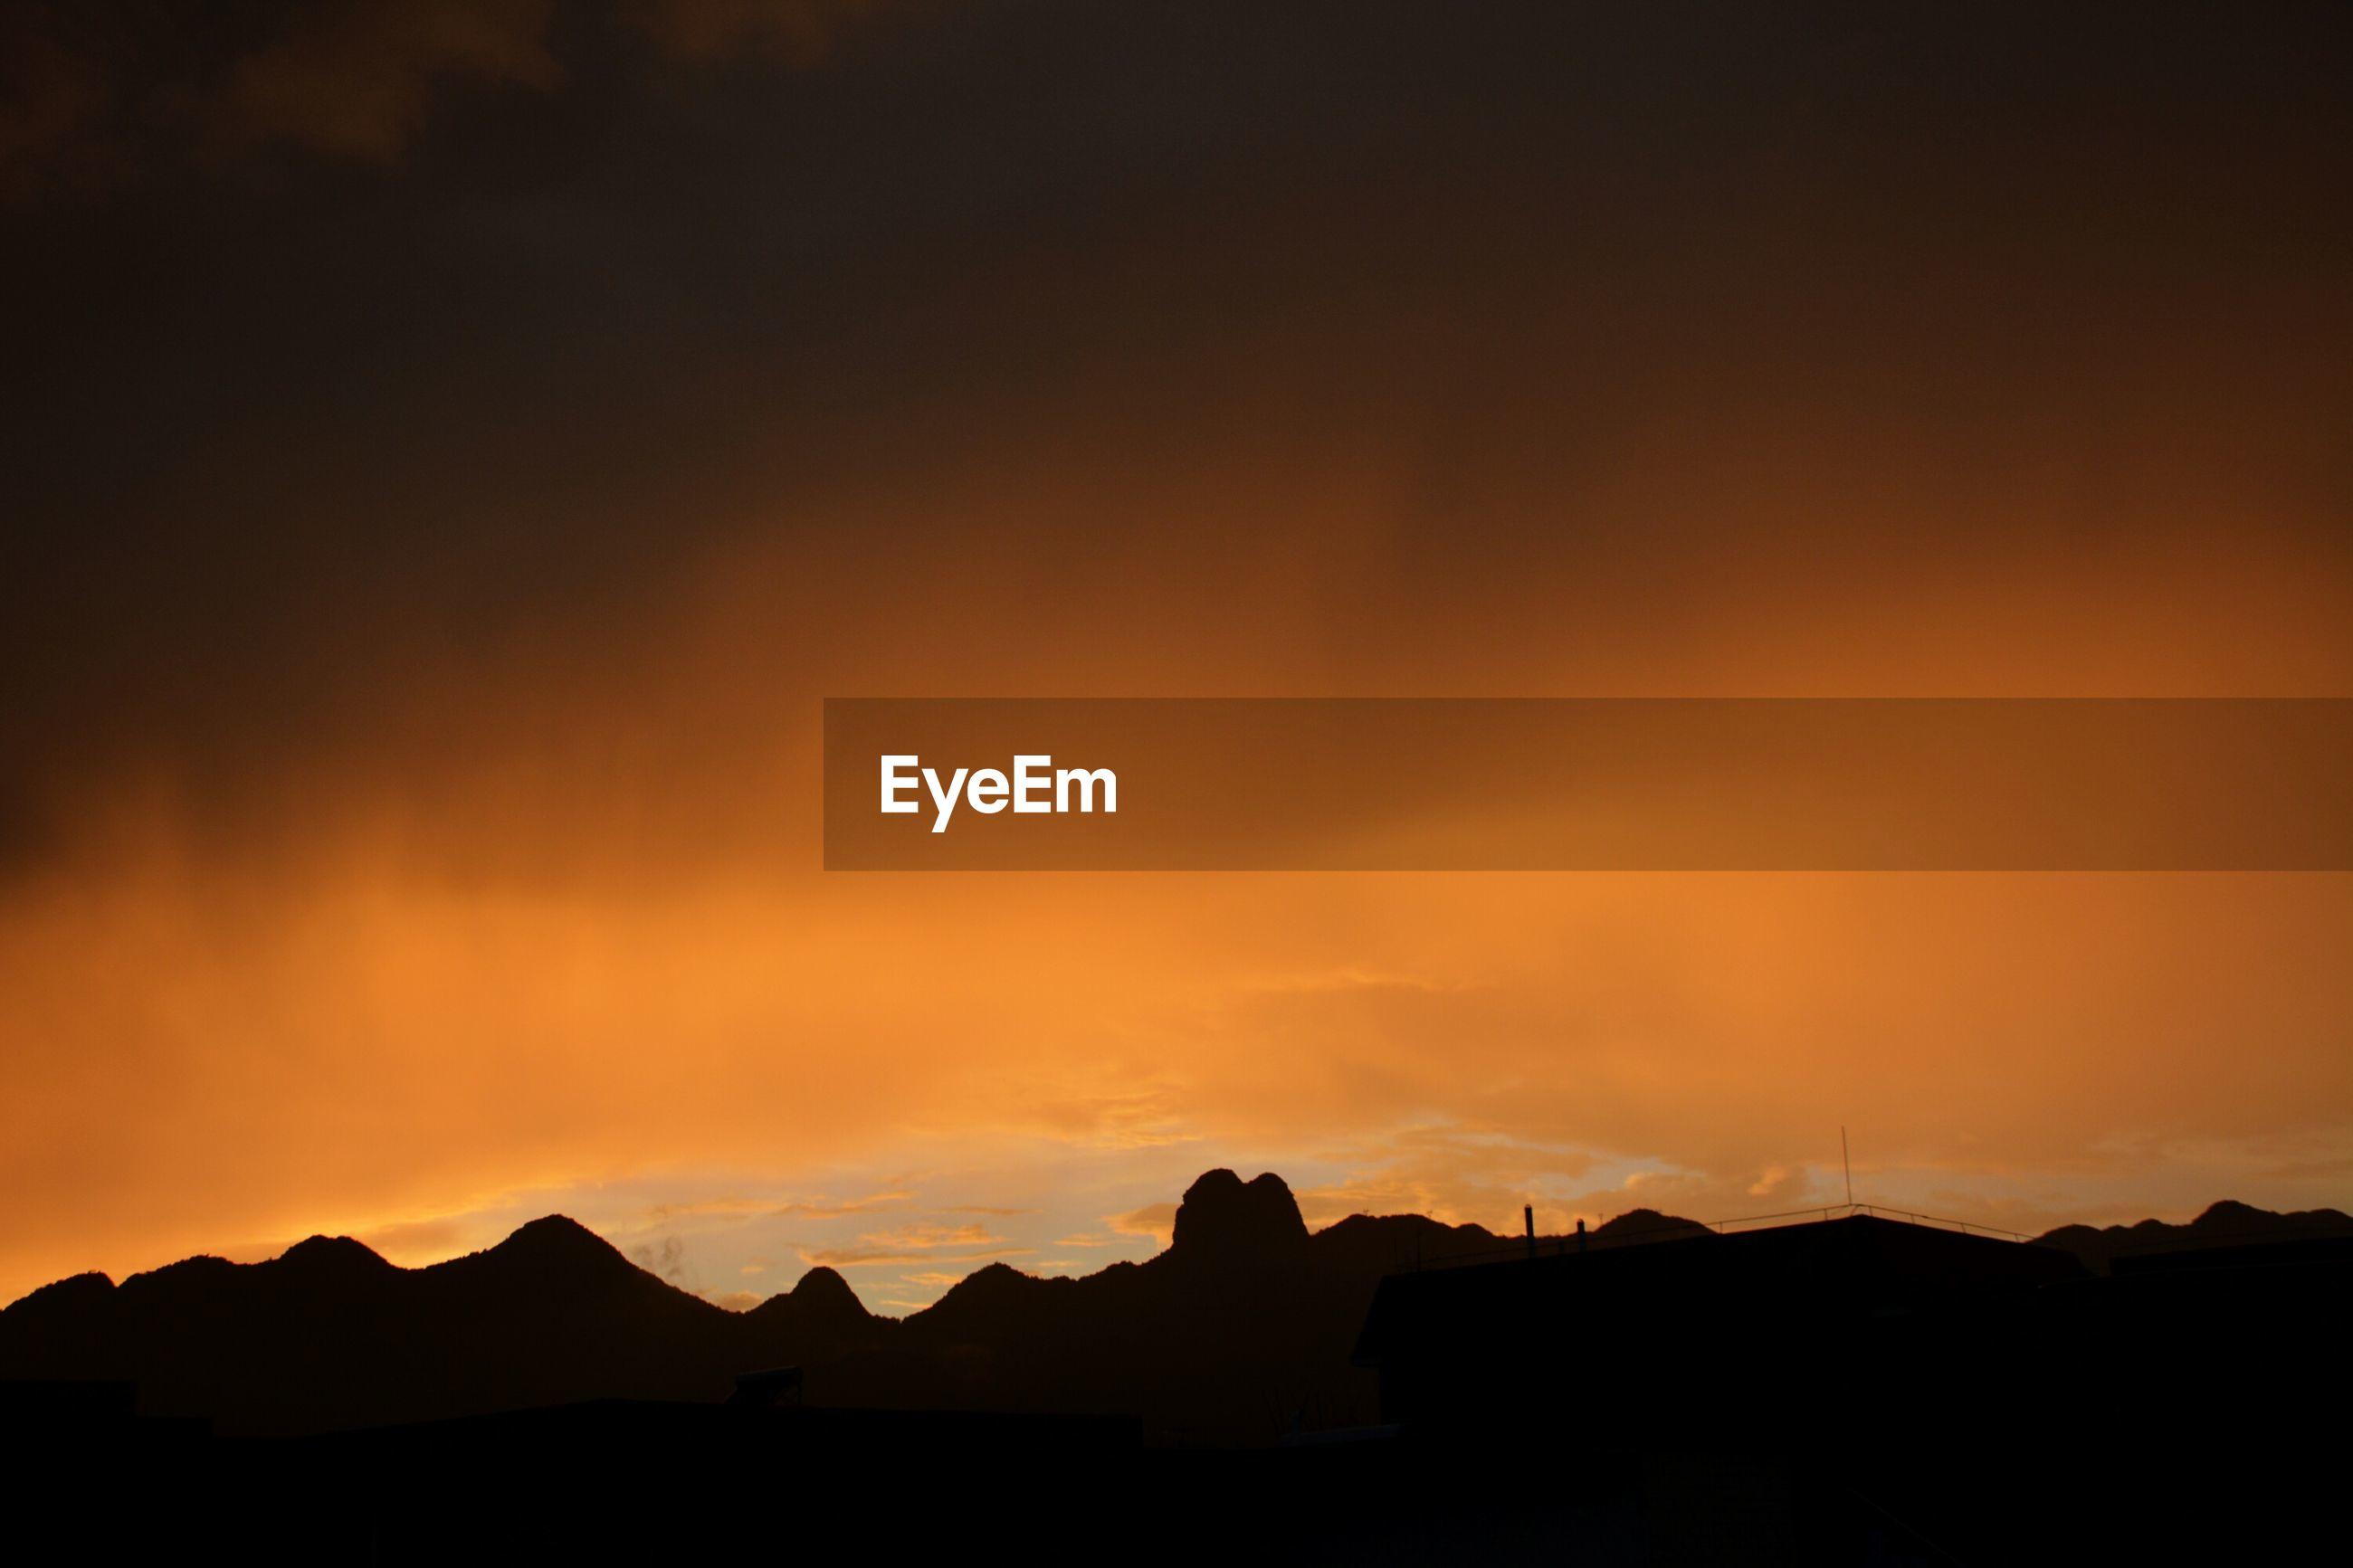 sunset, silhouette, scenics, mountain, beauty in nature, tranquil scene, sky, tranquility, orange color, nature, idyllic, cloud - sky, mountain range, landscape, cloud, dramatic sky, majestic, dark, outdoors, no people, outline, non-urban scene, non urban scene, remote